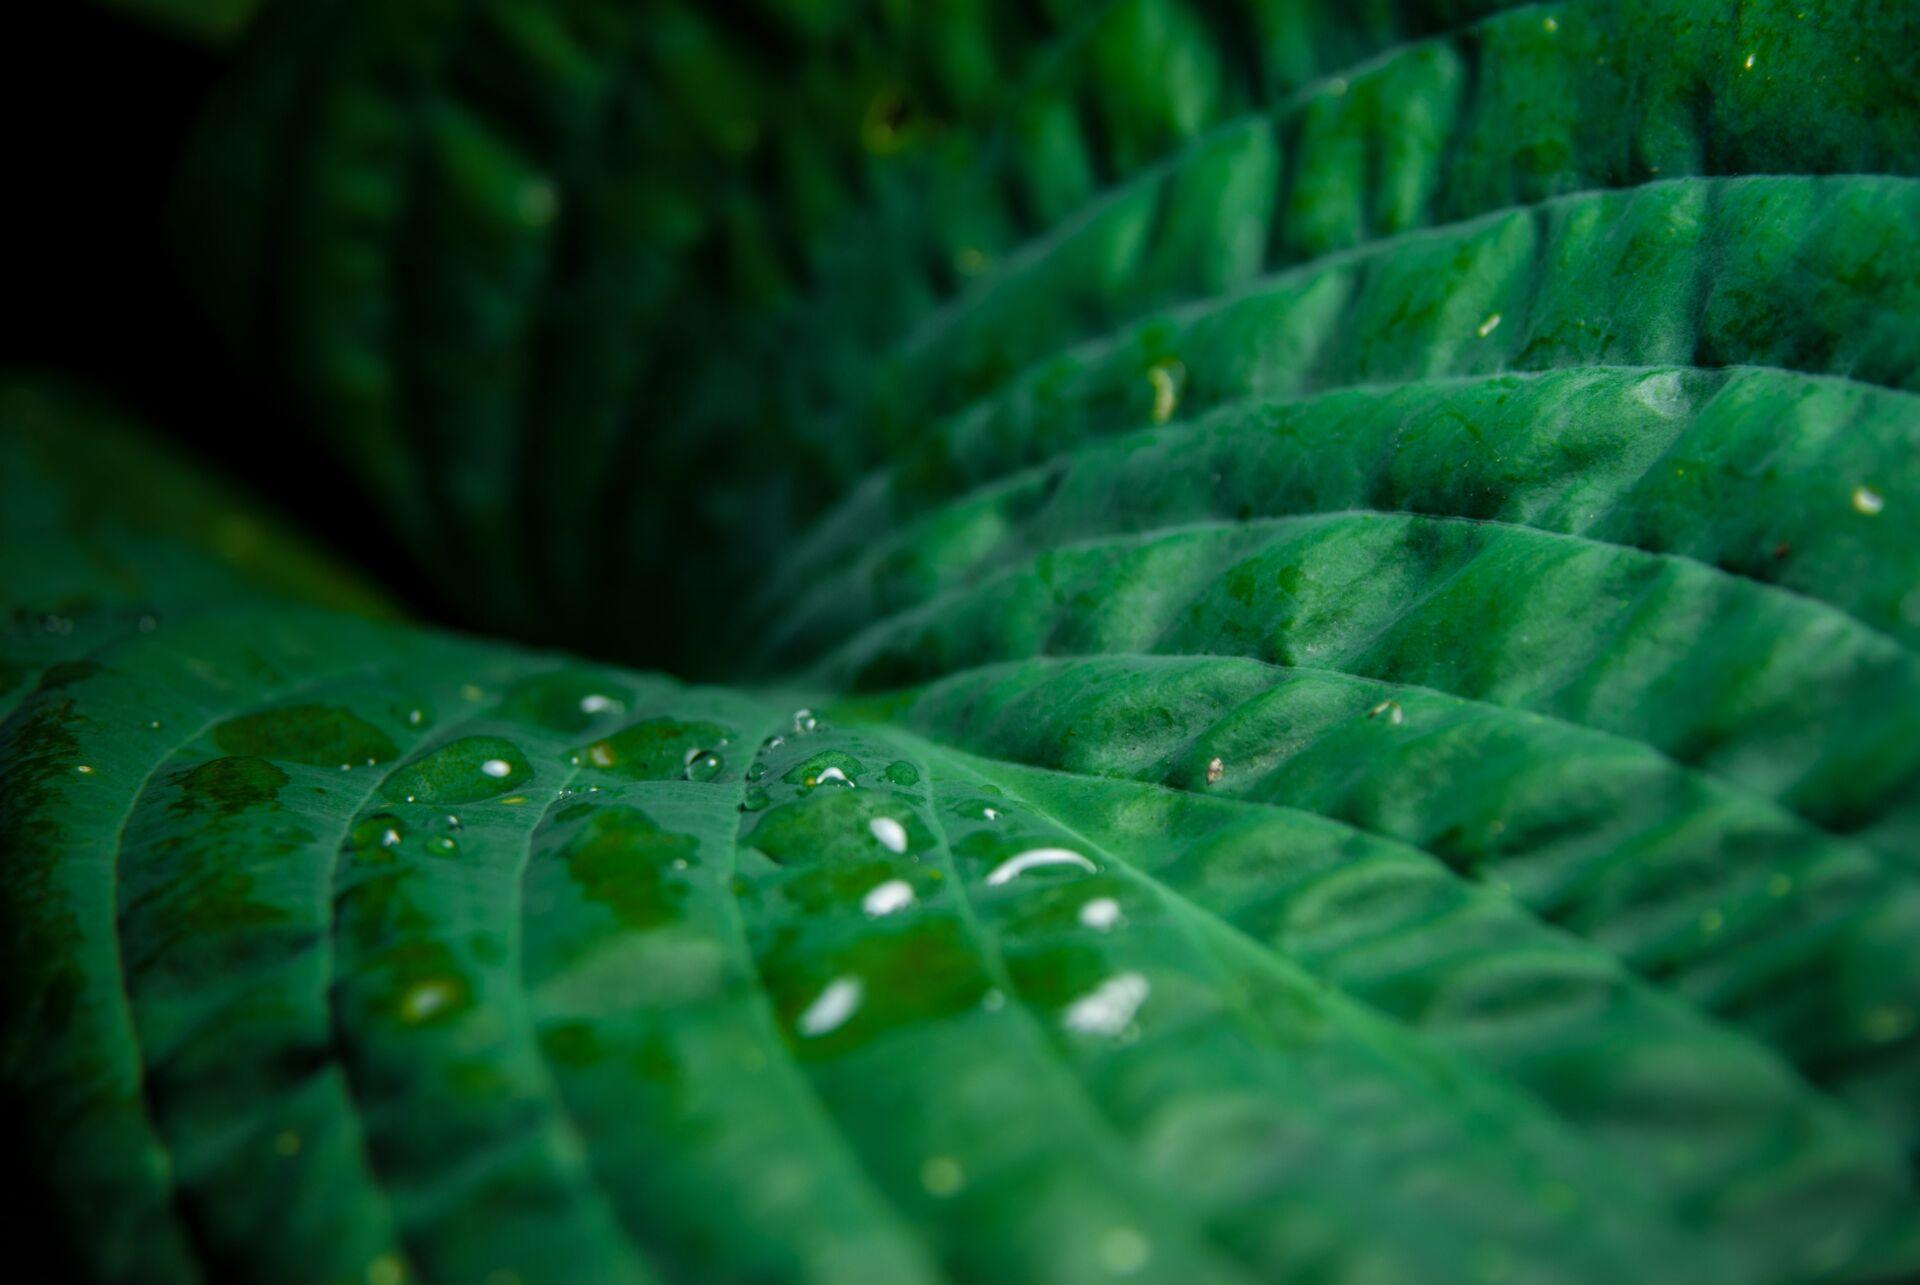 close up leaf with raindrop